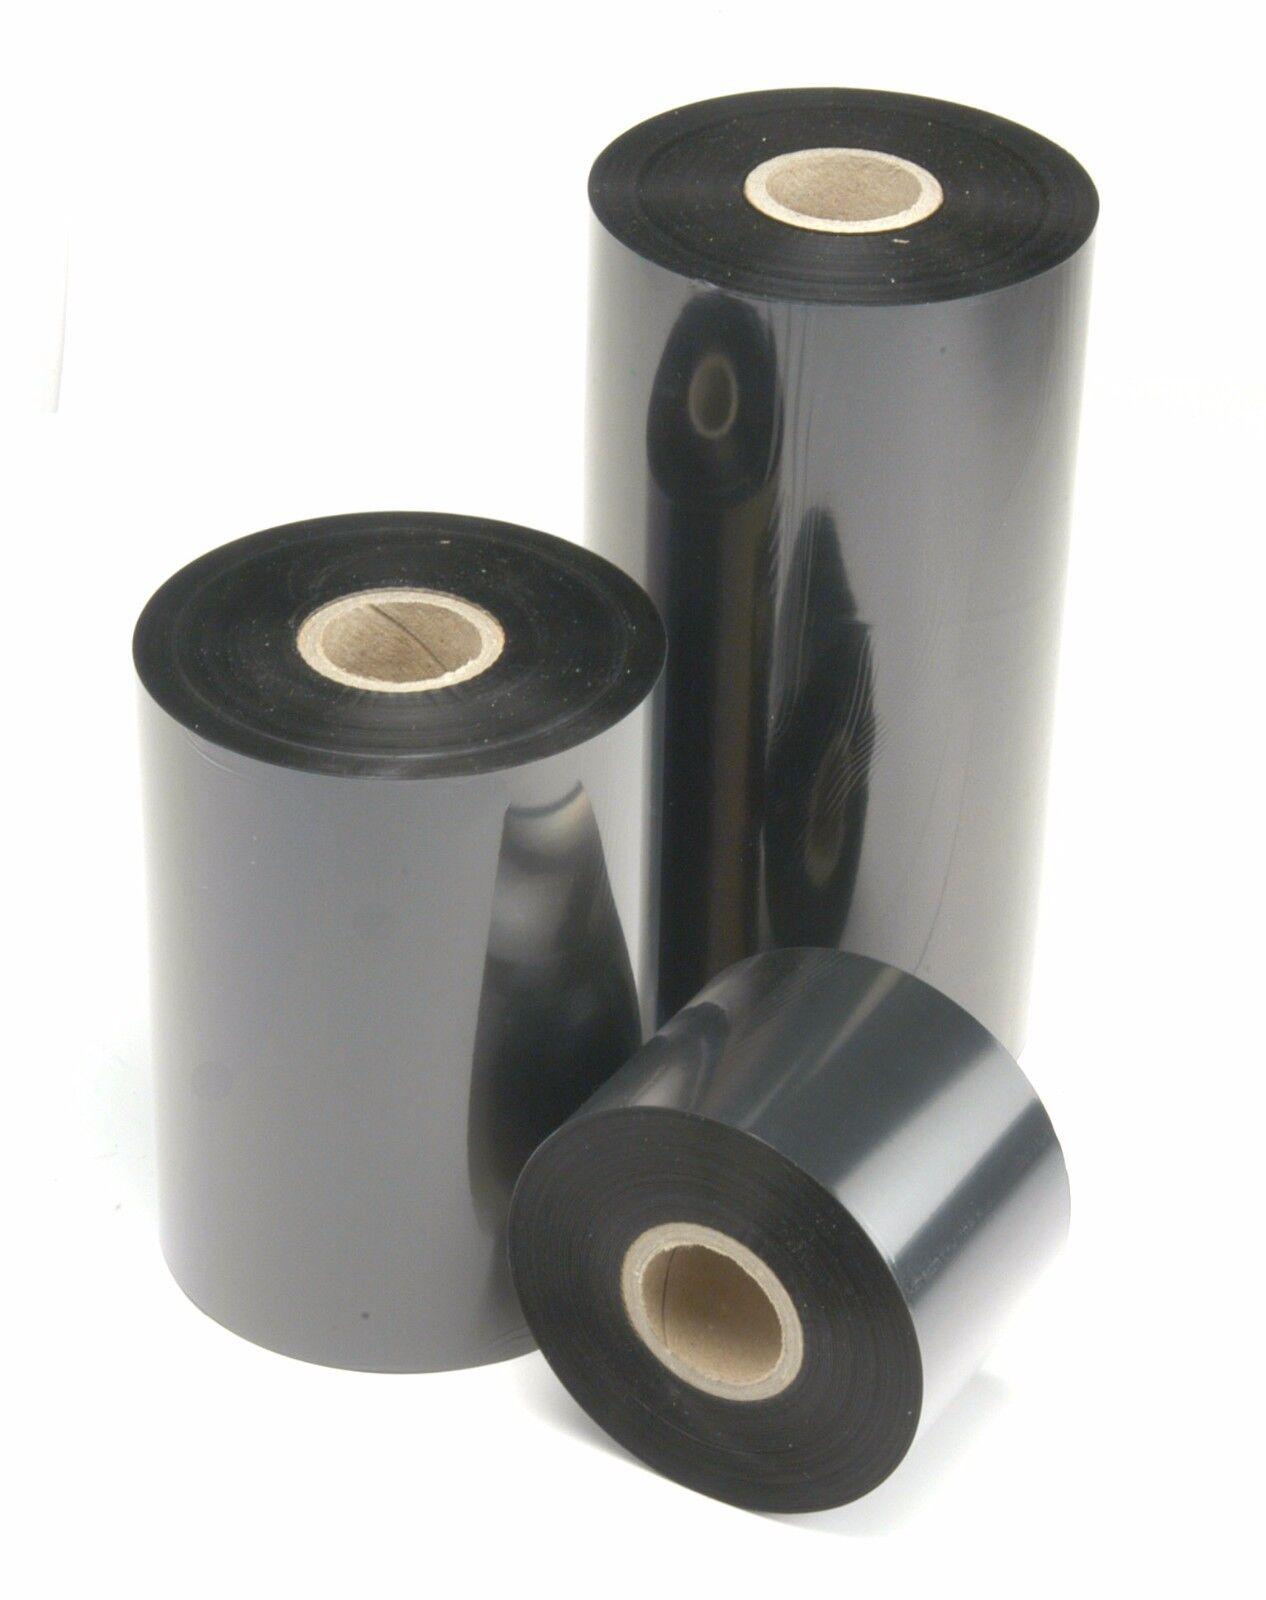 6 Rolls Thermal Transfer Resin Enhanced Wax Ribbon Zebra Printers 4.33  x 1476'